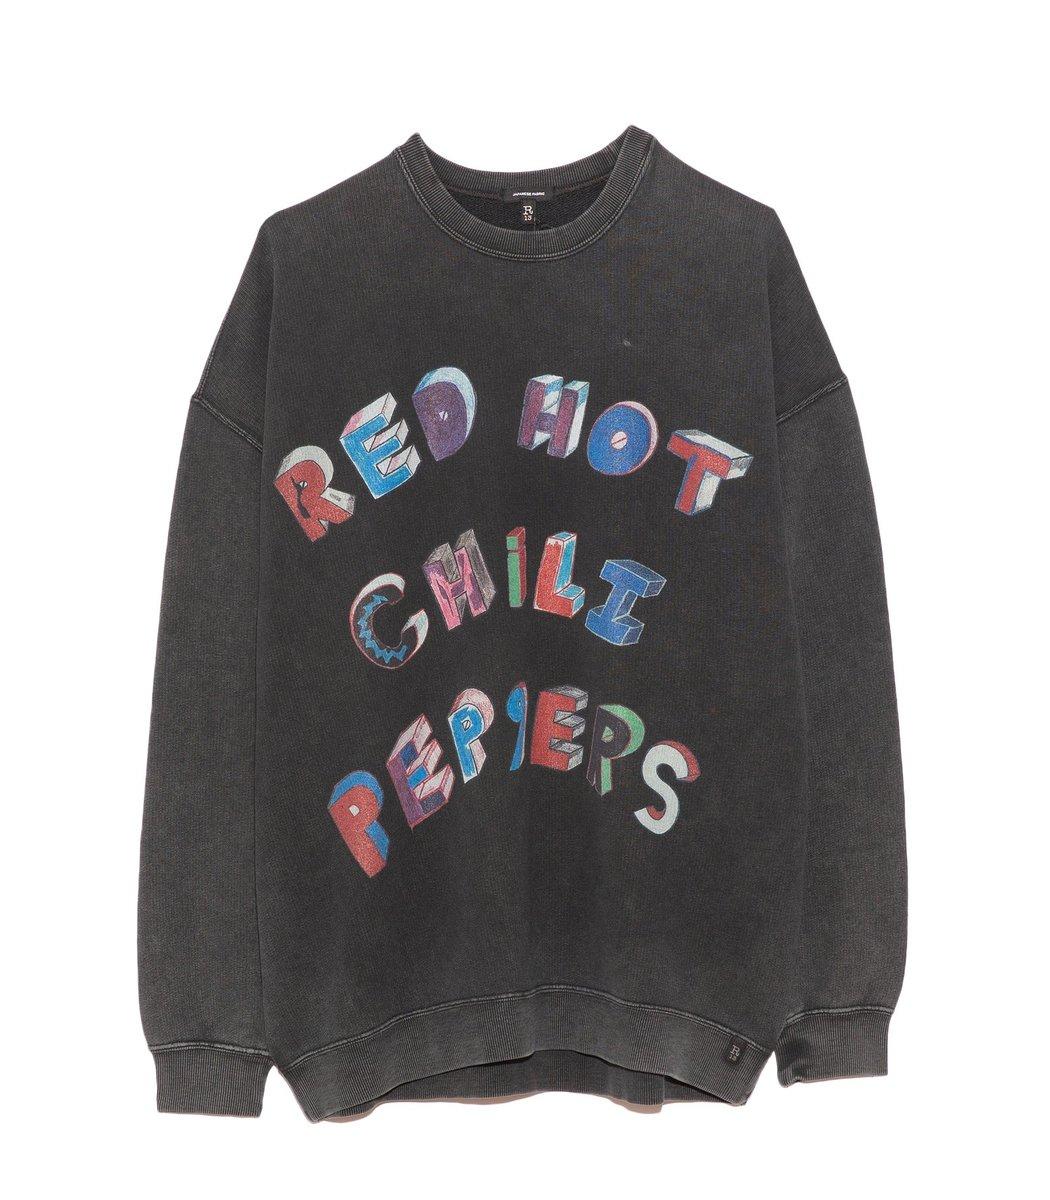 R13 Sweatshirts RHCP Flea Art Oversized Crewneck in Aged Black